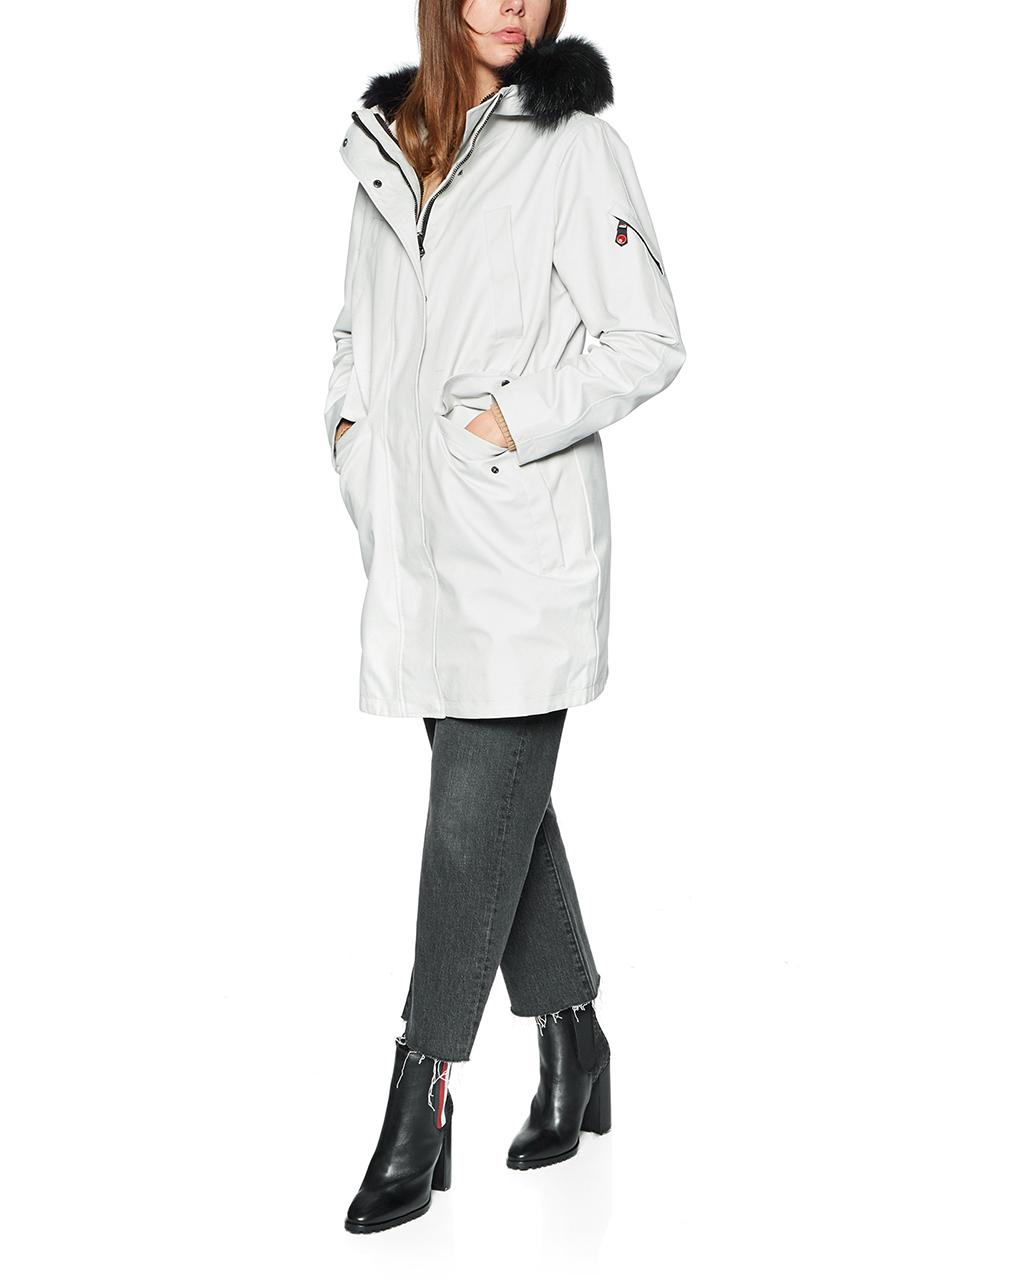 Verkauf The Long Parka Damen Winters Antarctica Jacke 49 0XOPnN8wk